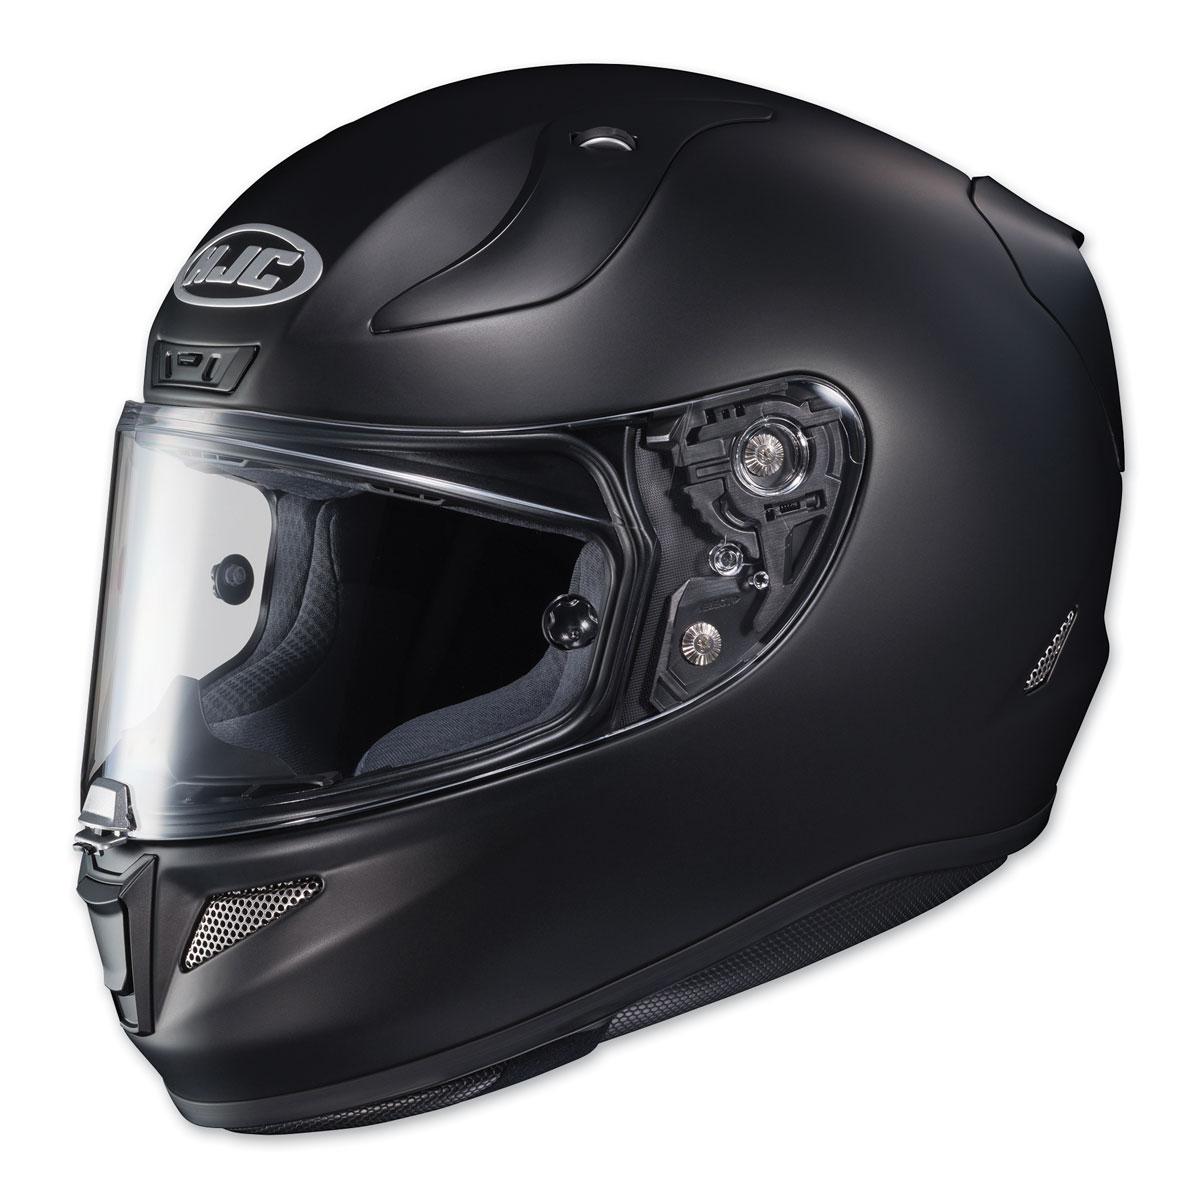 HJC RPHA 11 Pro Semi-Flat Black Full Face Helmet